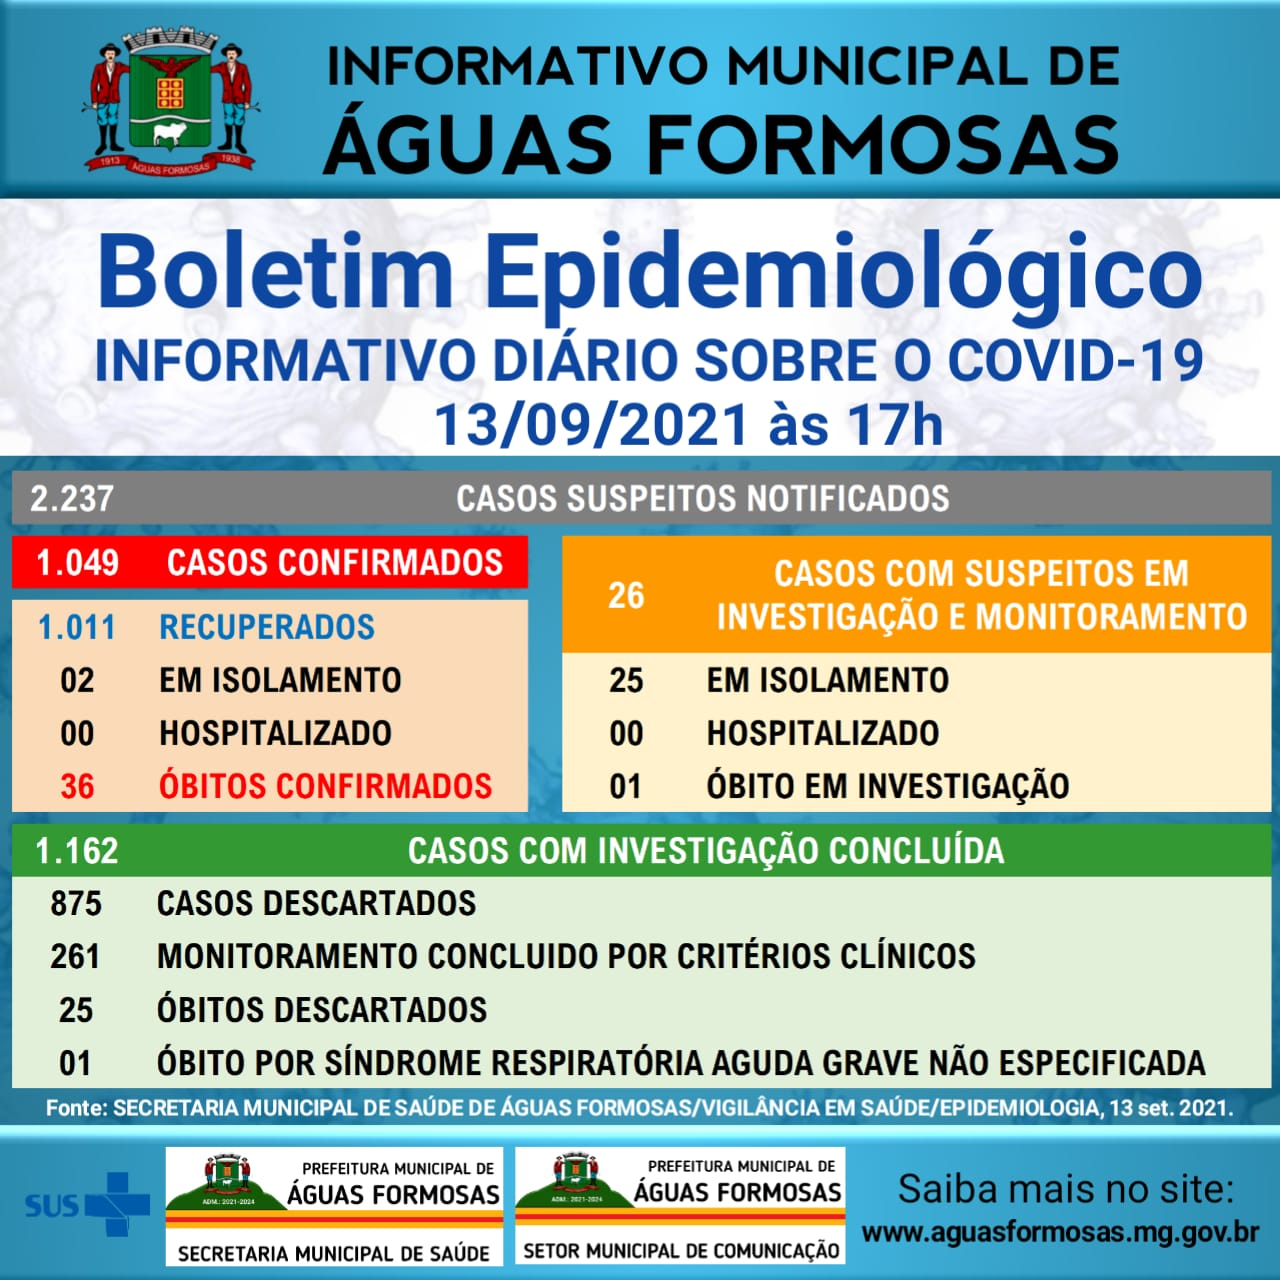 BOLETIM EPIDEMIOLÓGICO CORONAVÍRUS - 13/09/2021